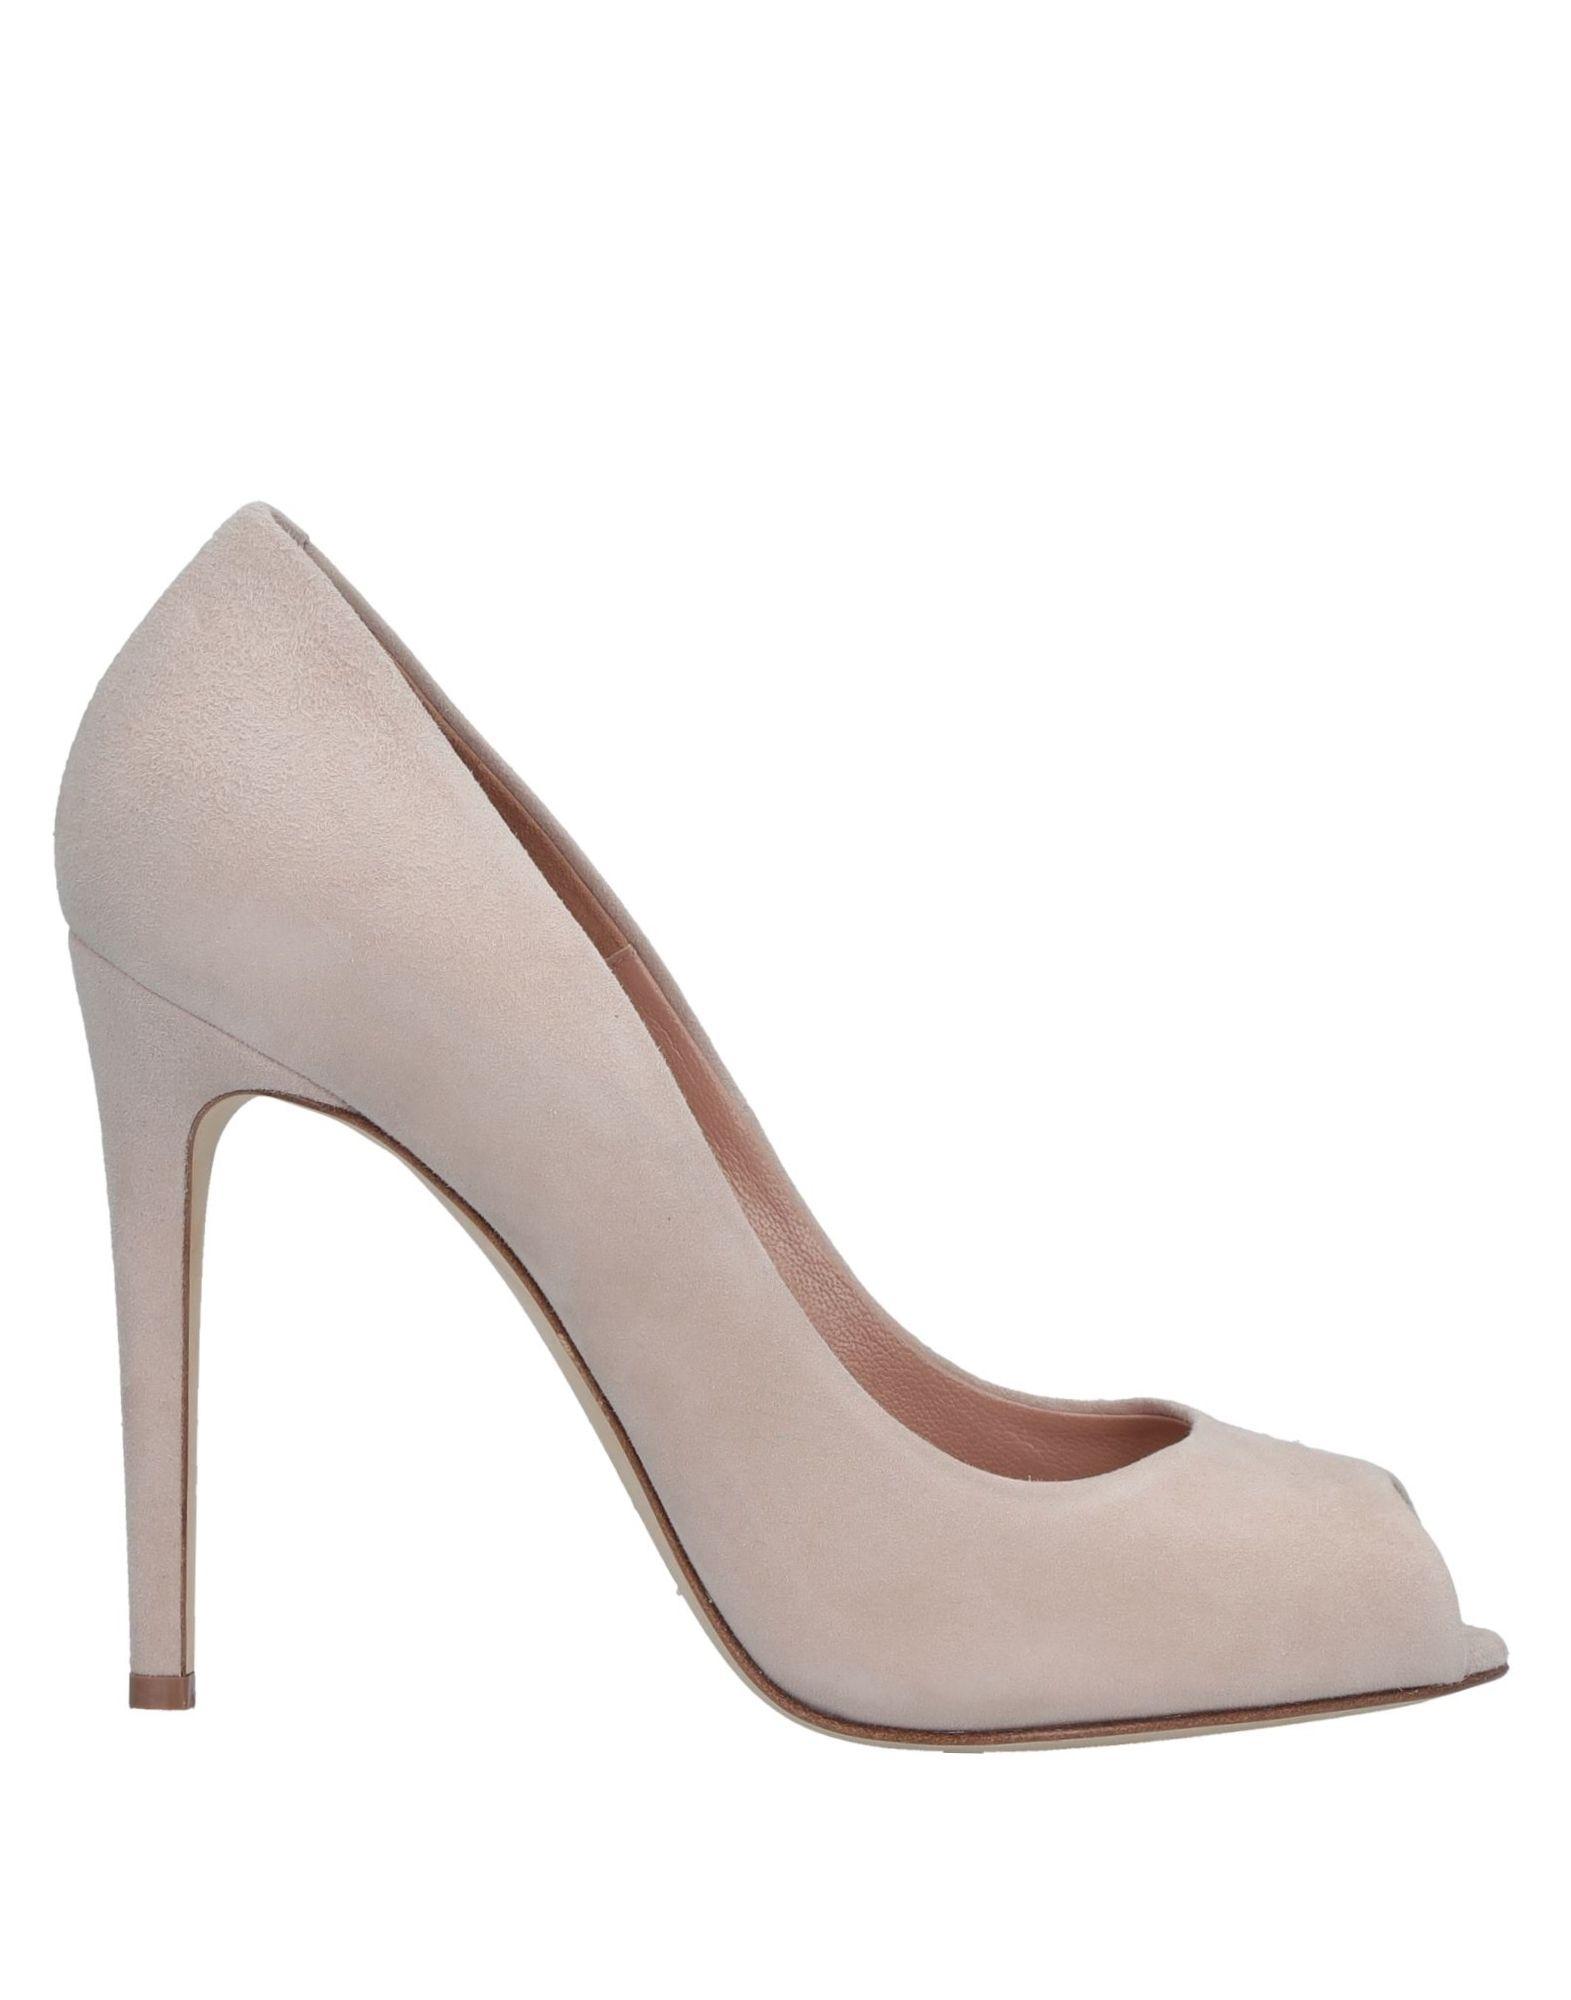 Sandali Sara Donna - scarpe 11467682CE Nuove offerte e scarpe - comode 01e416